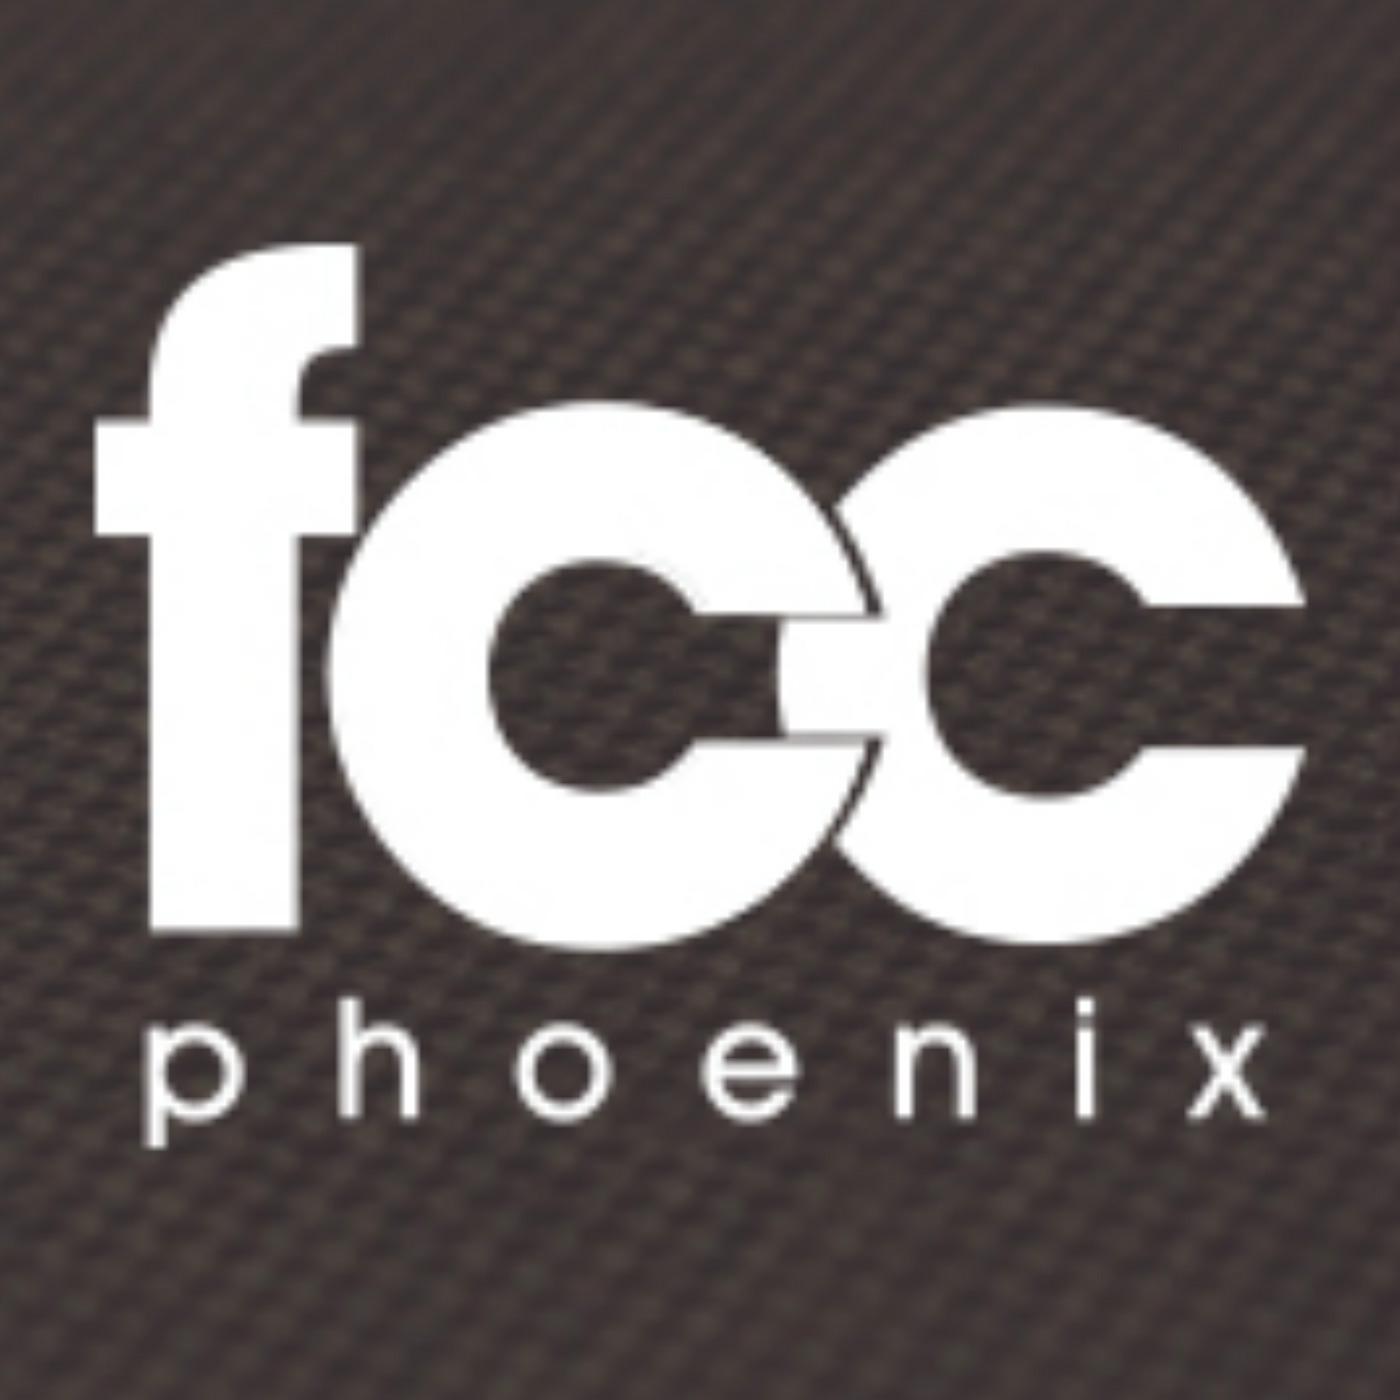 FCCPHX